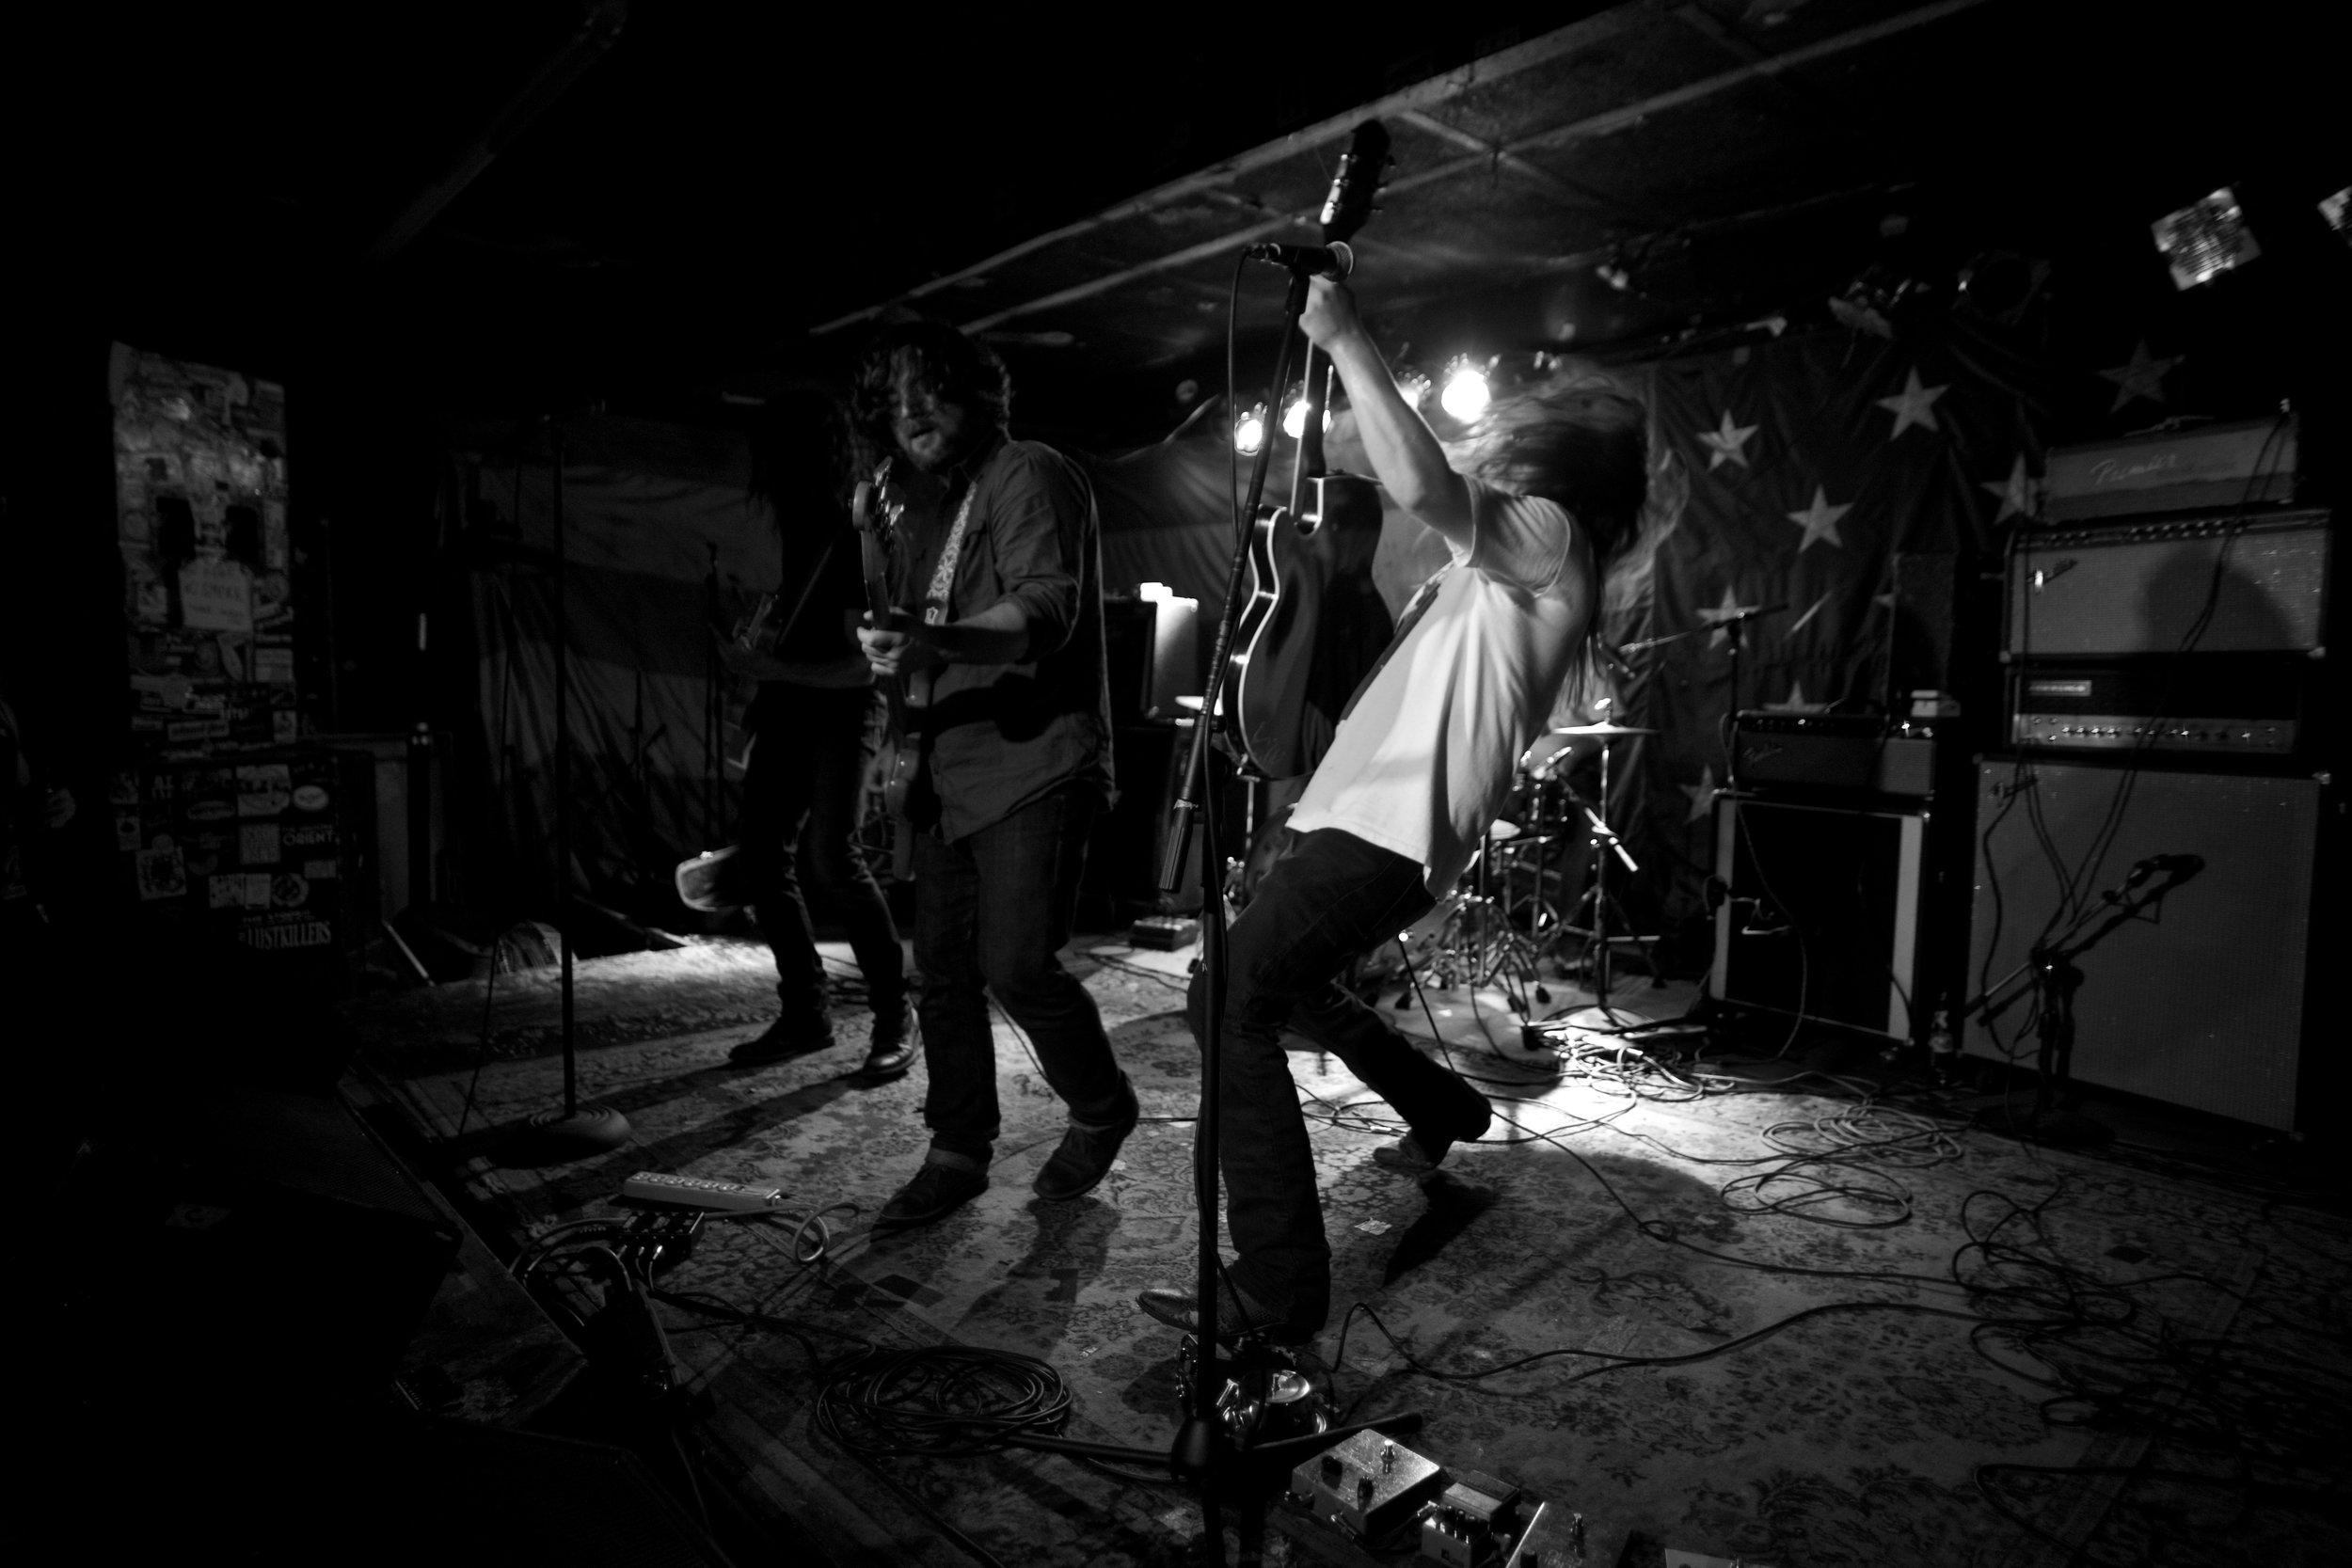 Black Willis. The Nick. Birmingham, AL. 2016.